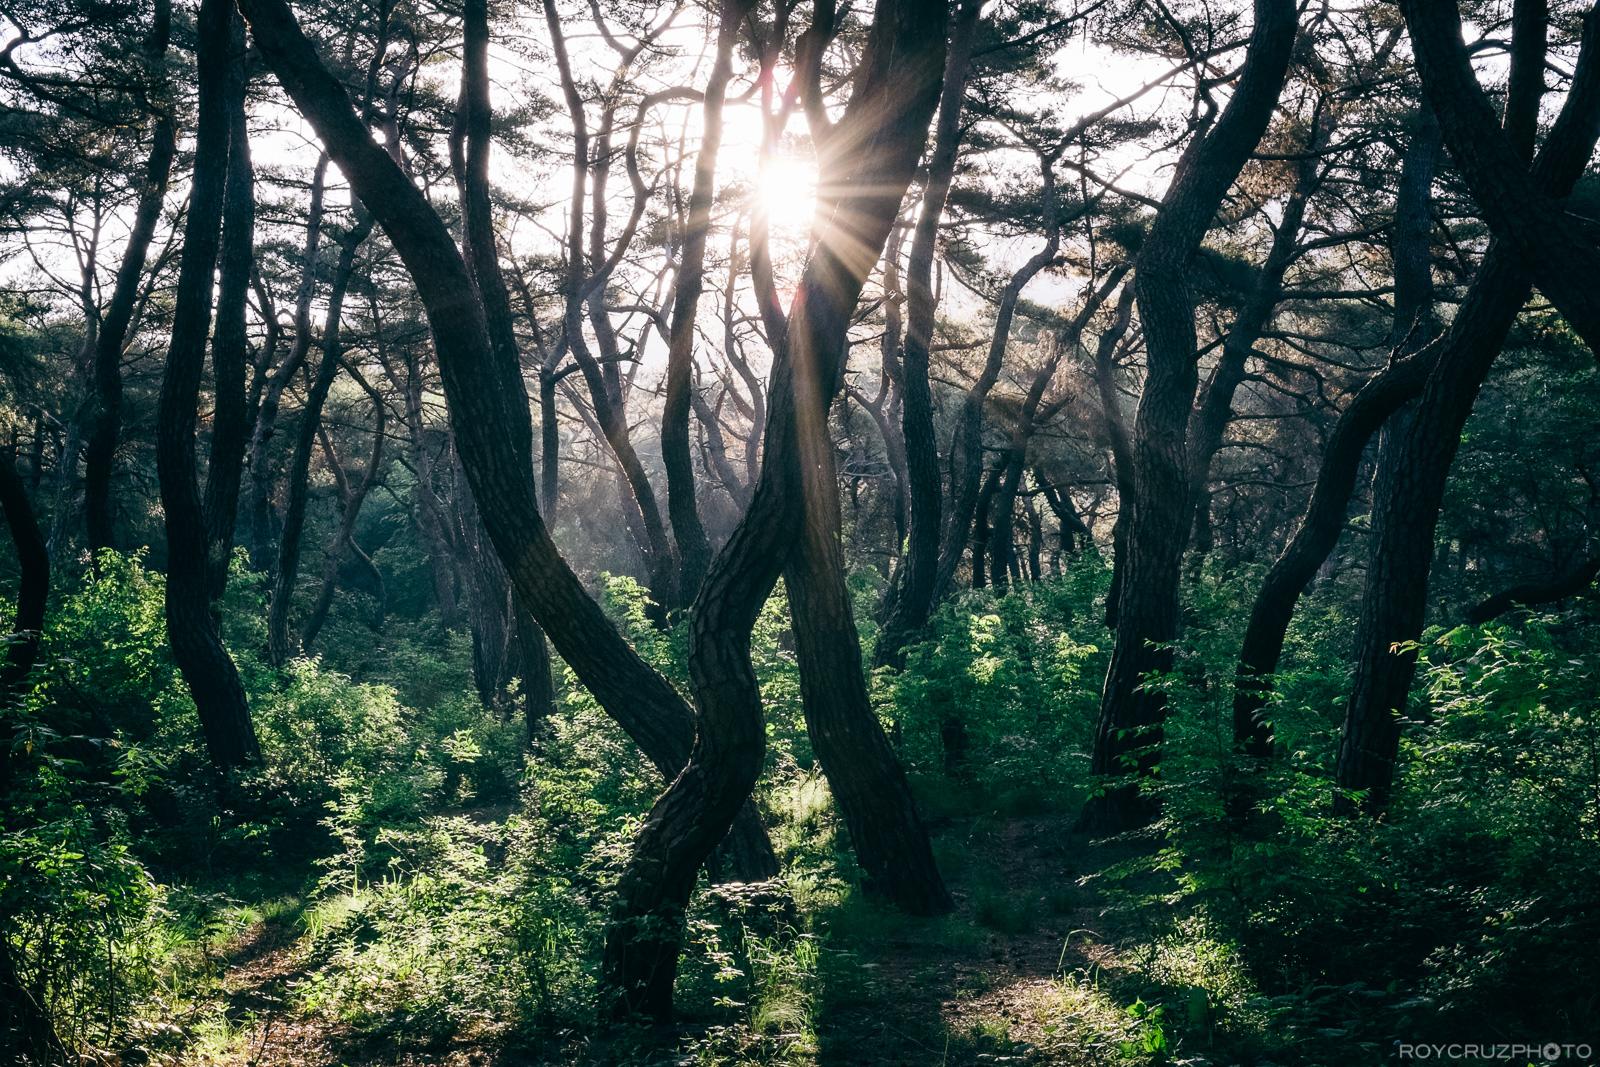 Gyeongju Samneung Forest 경주 삼릉숲